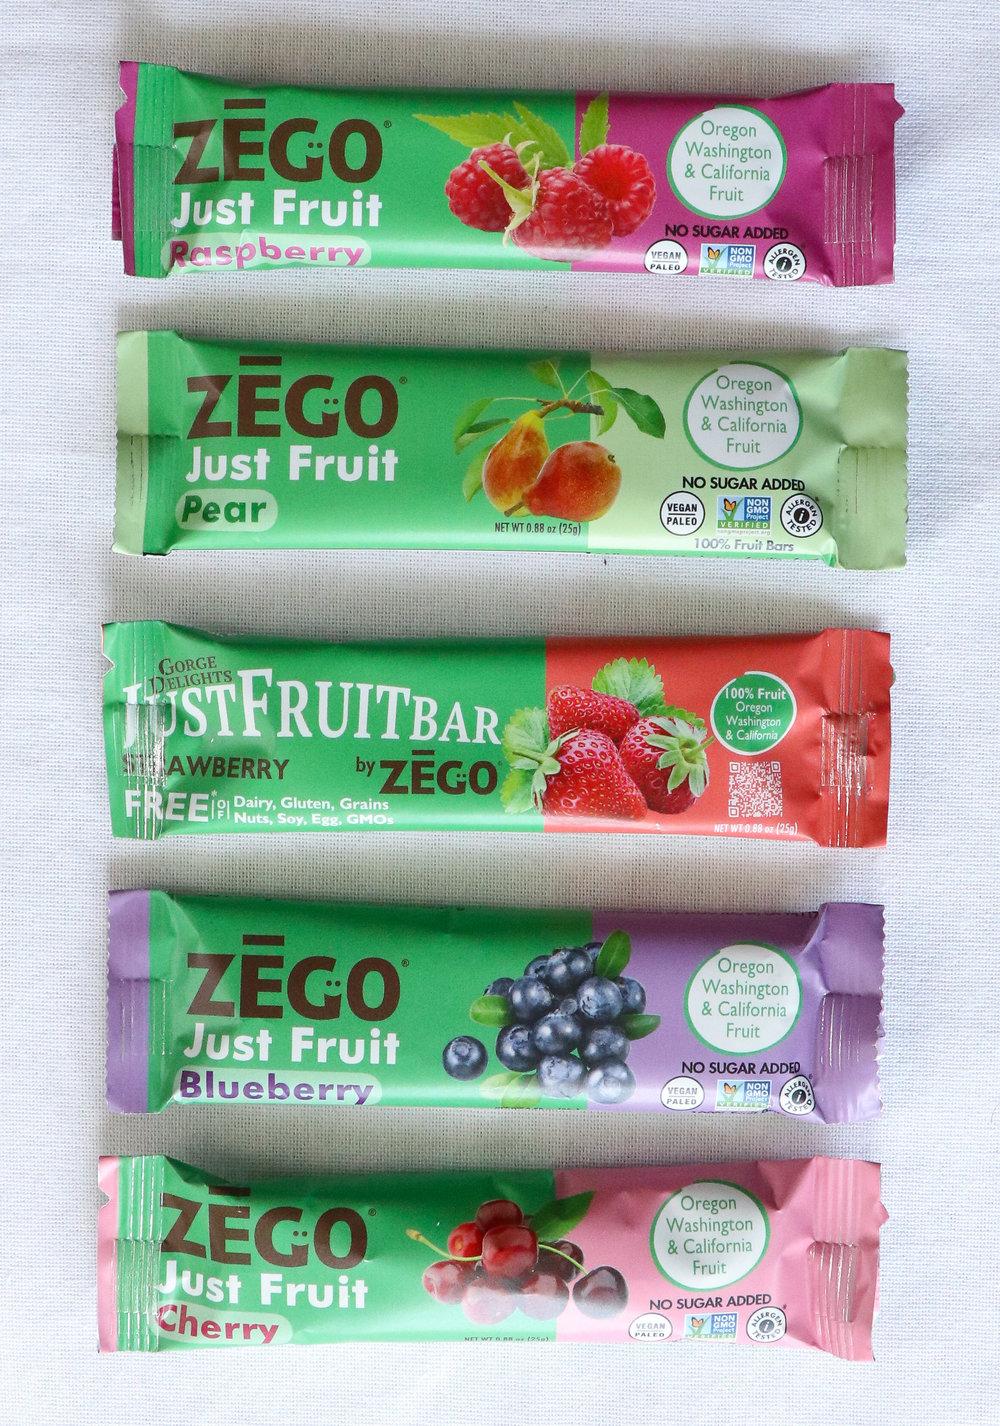 ZEGO allergy free snacks